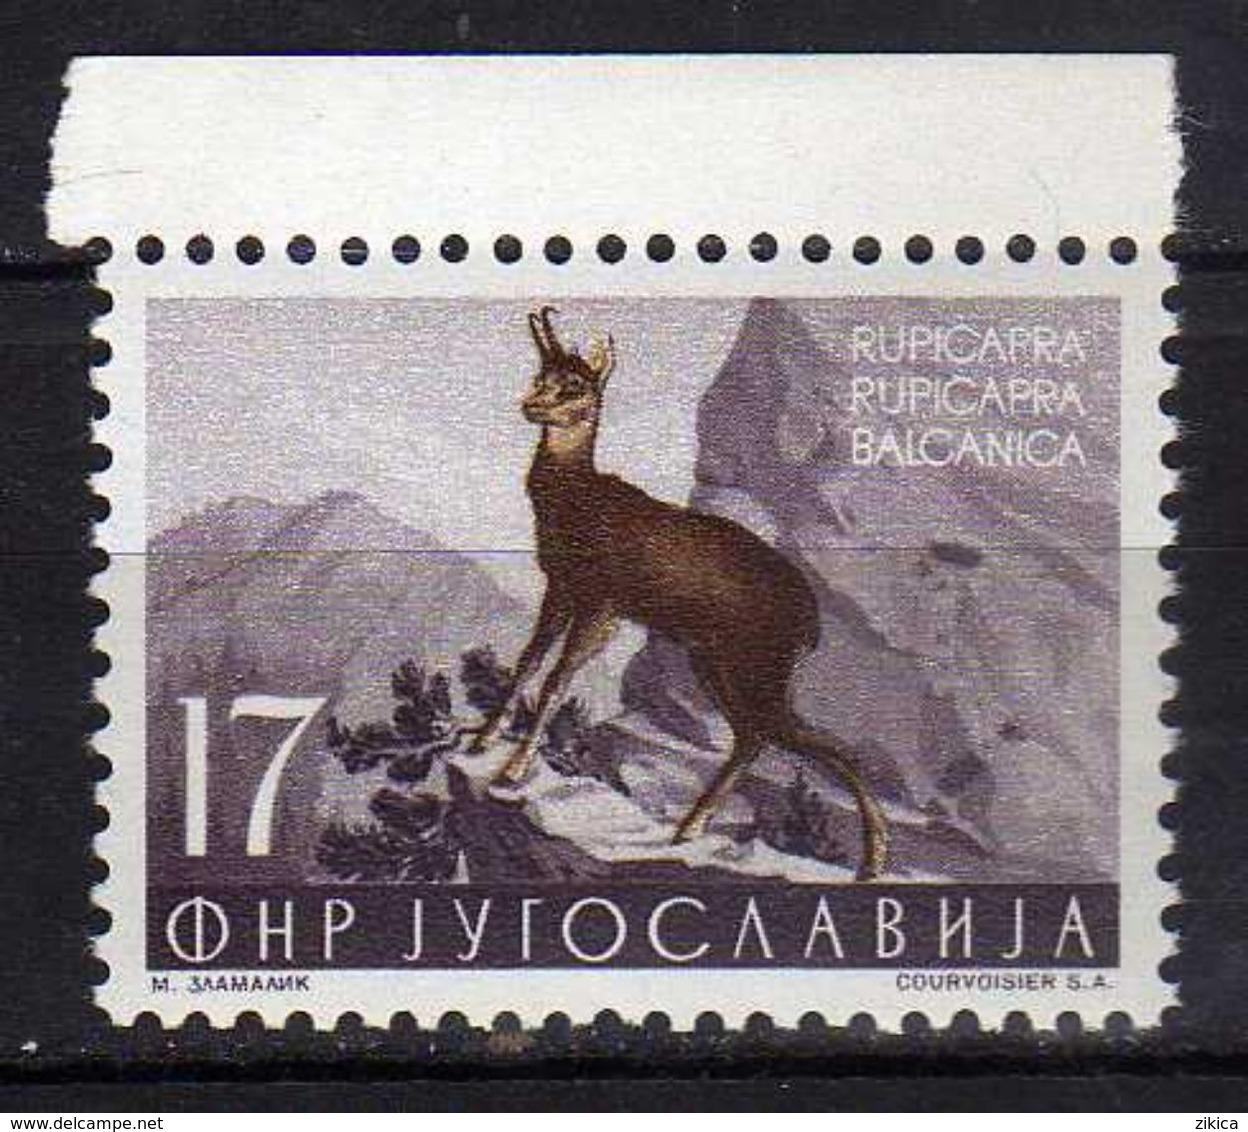 Yugoslavia 1954 Local Fauna.- Animals Mammals Rupicapra  Goat Antelope  Chamois ( Rupicapra Rupicapra ) MNH - 1945-1992 Socialistische Federale Republiek Joegoslavië